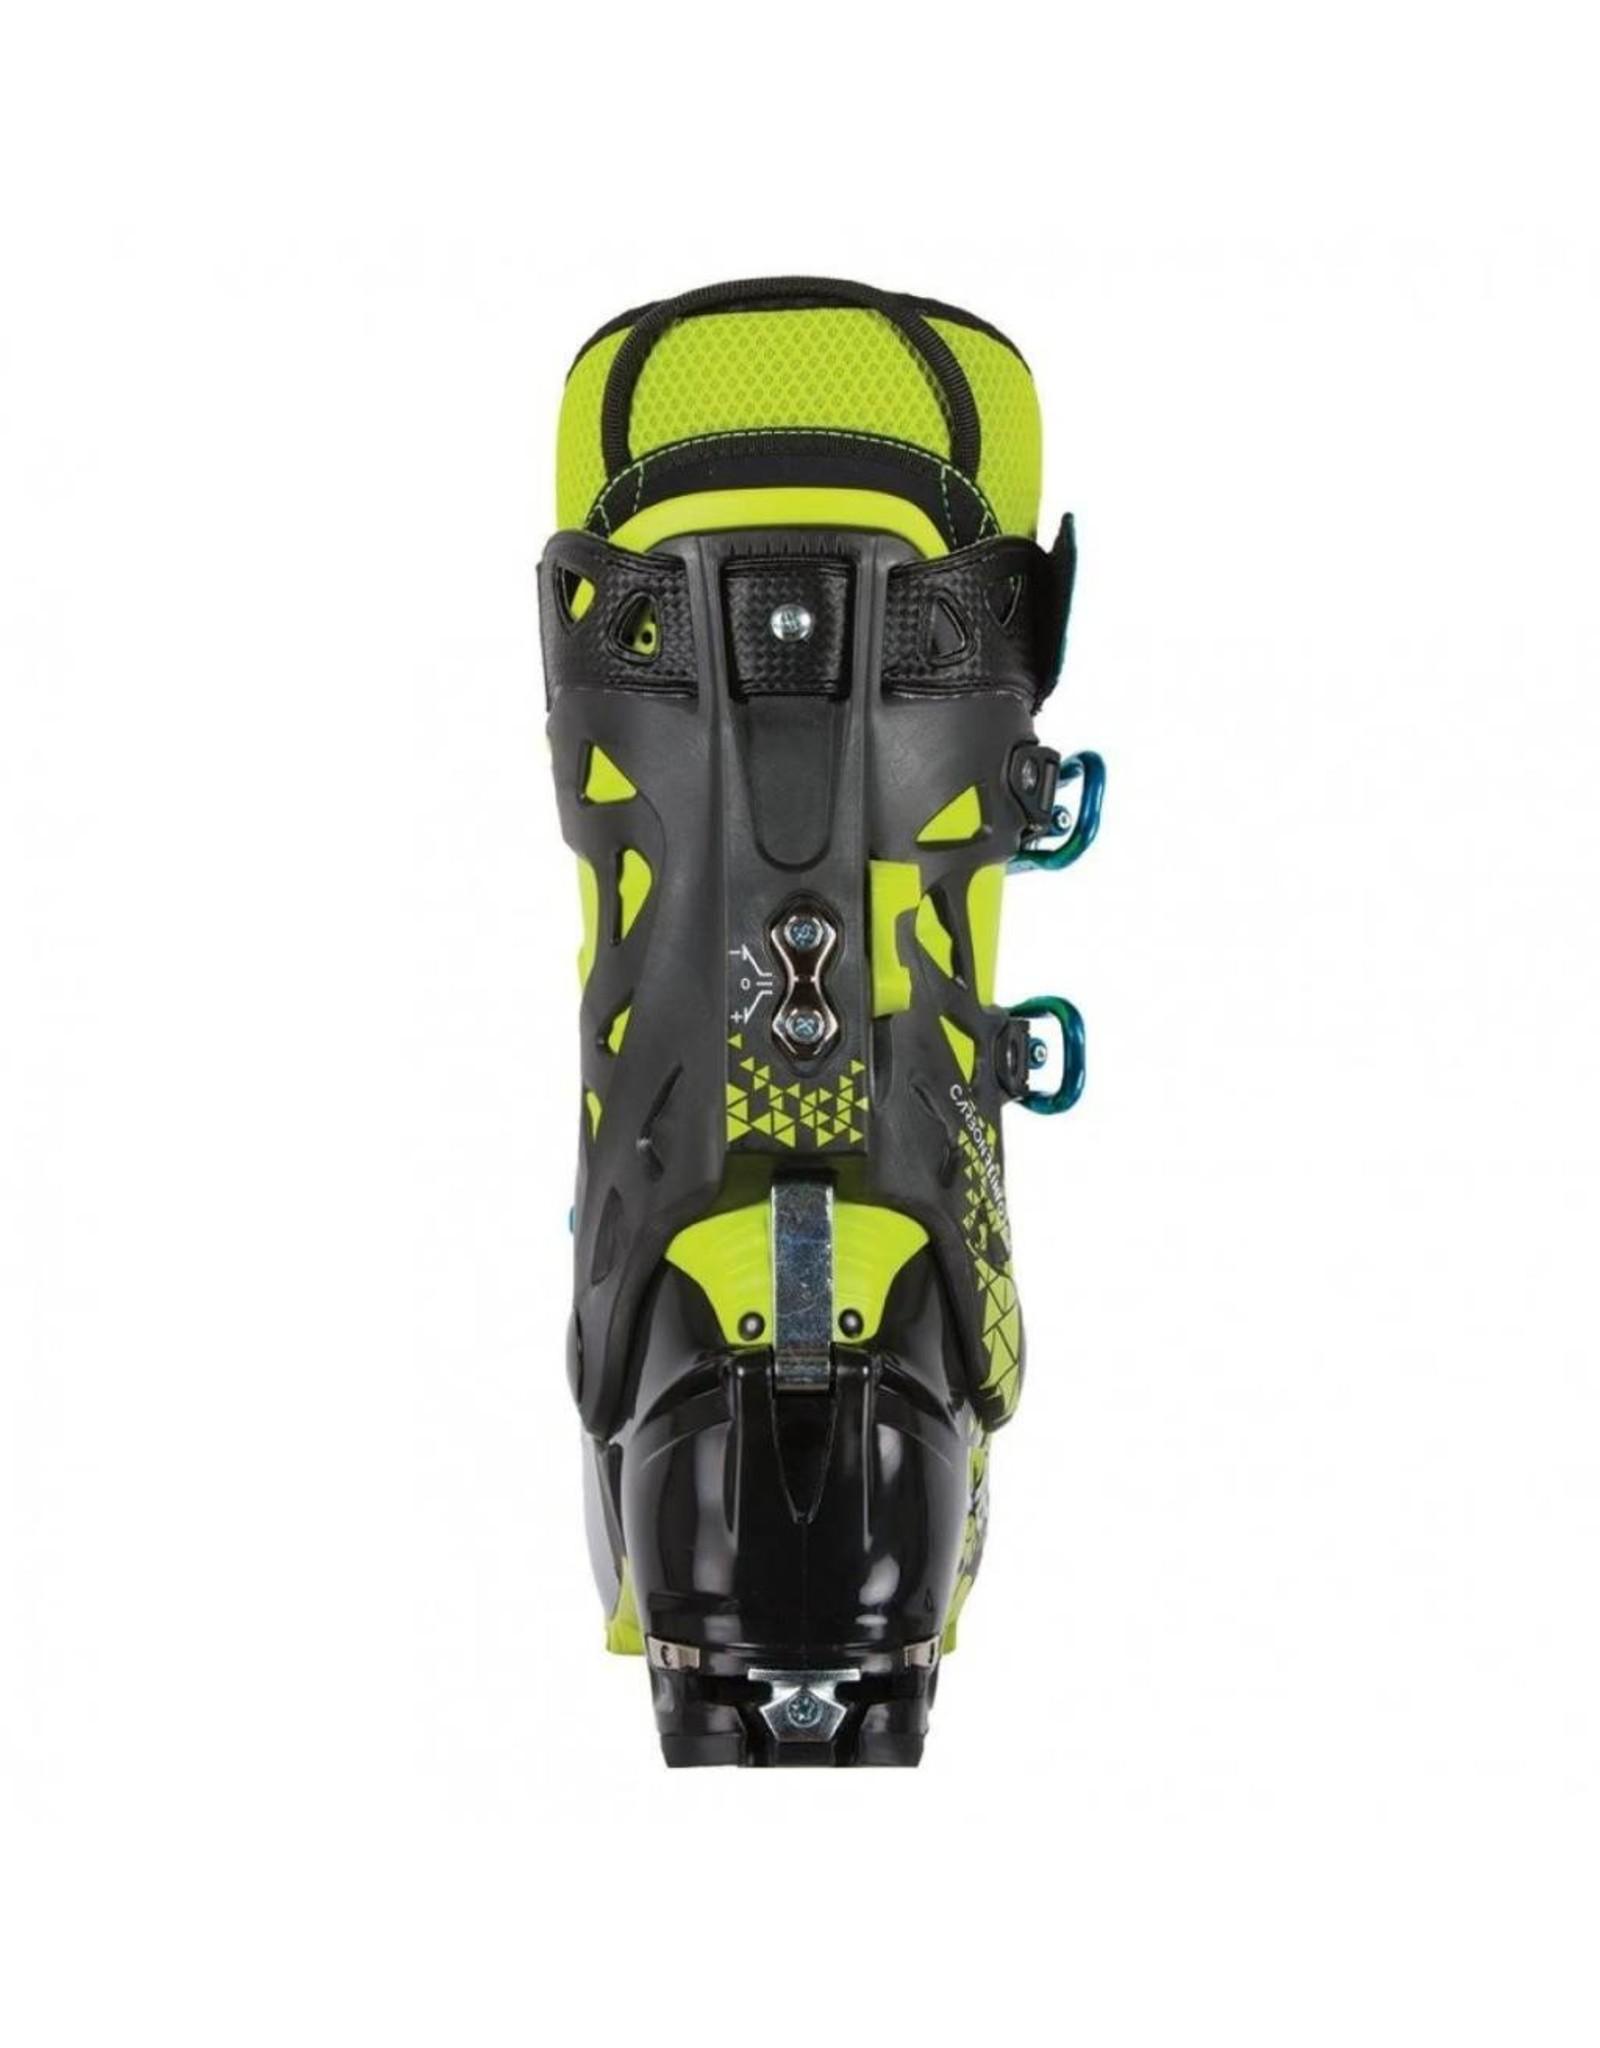 La Sportiva Botte de ski La Sportiva Spectre 2.0 - Homme